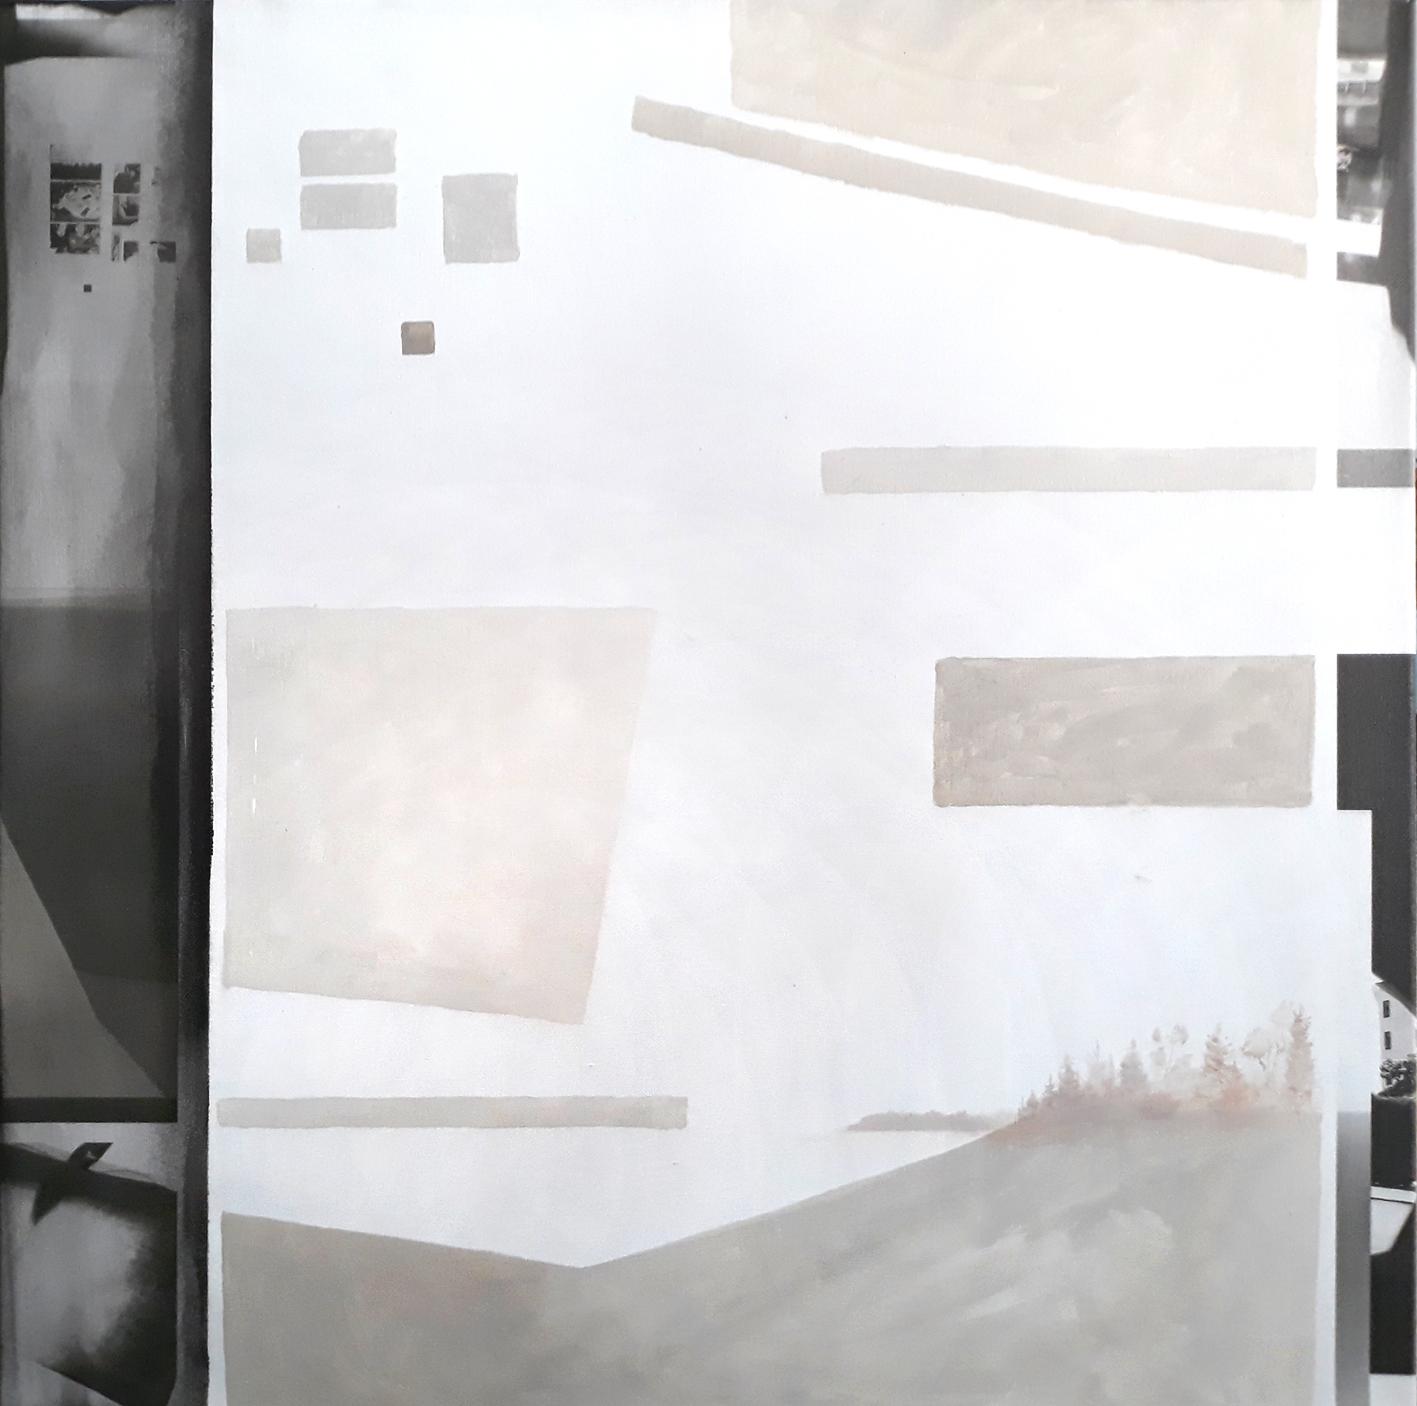 als dritter: Stephan Hafner mit Acryl